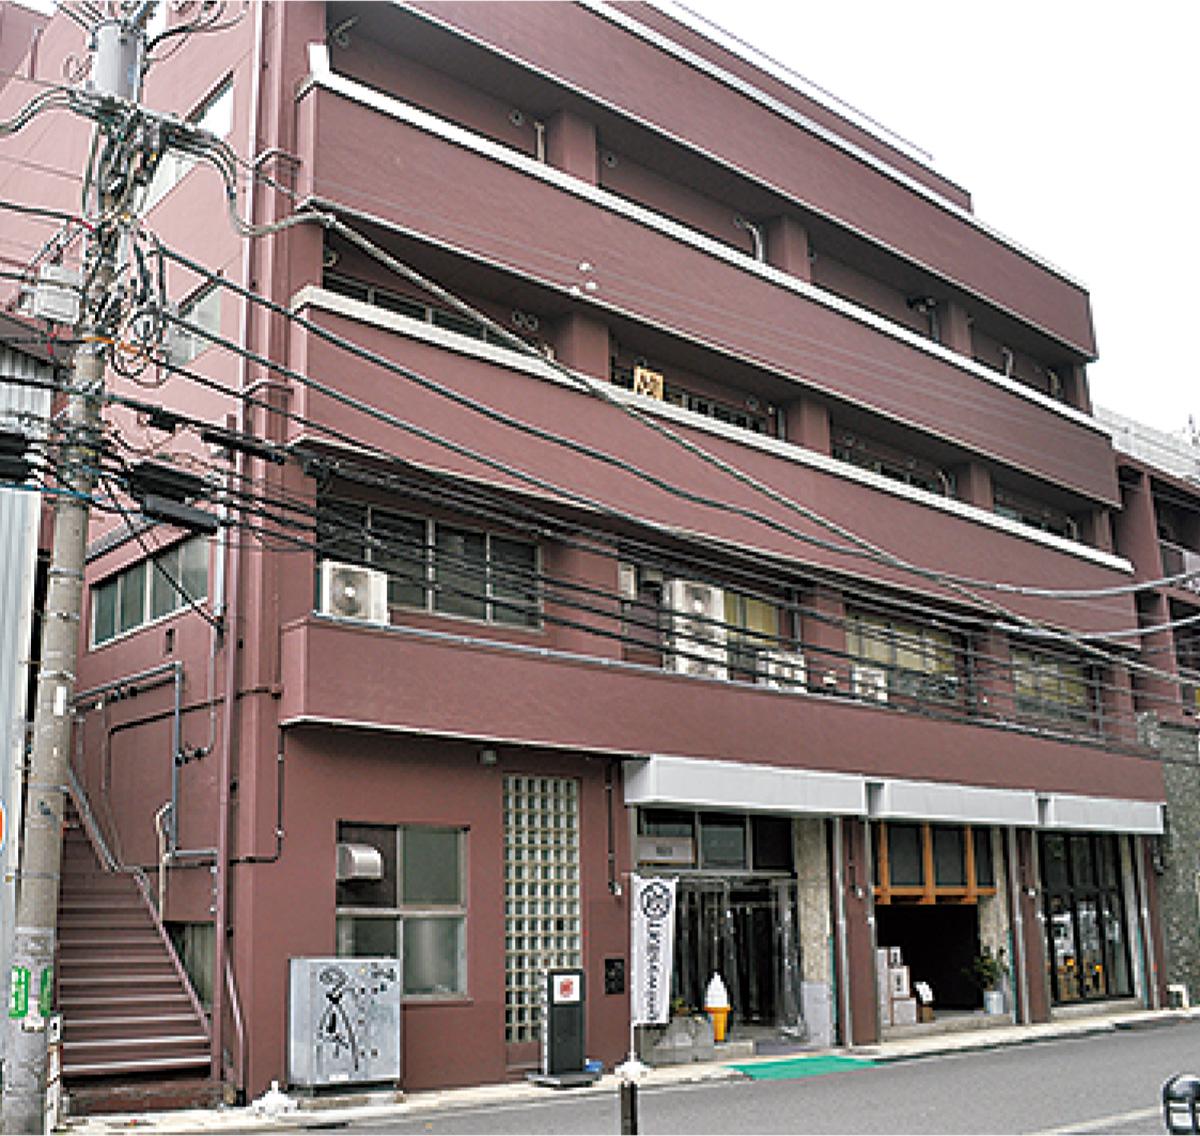 unico(ウニコ)でフリマ